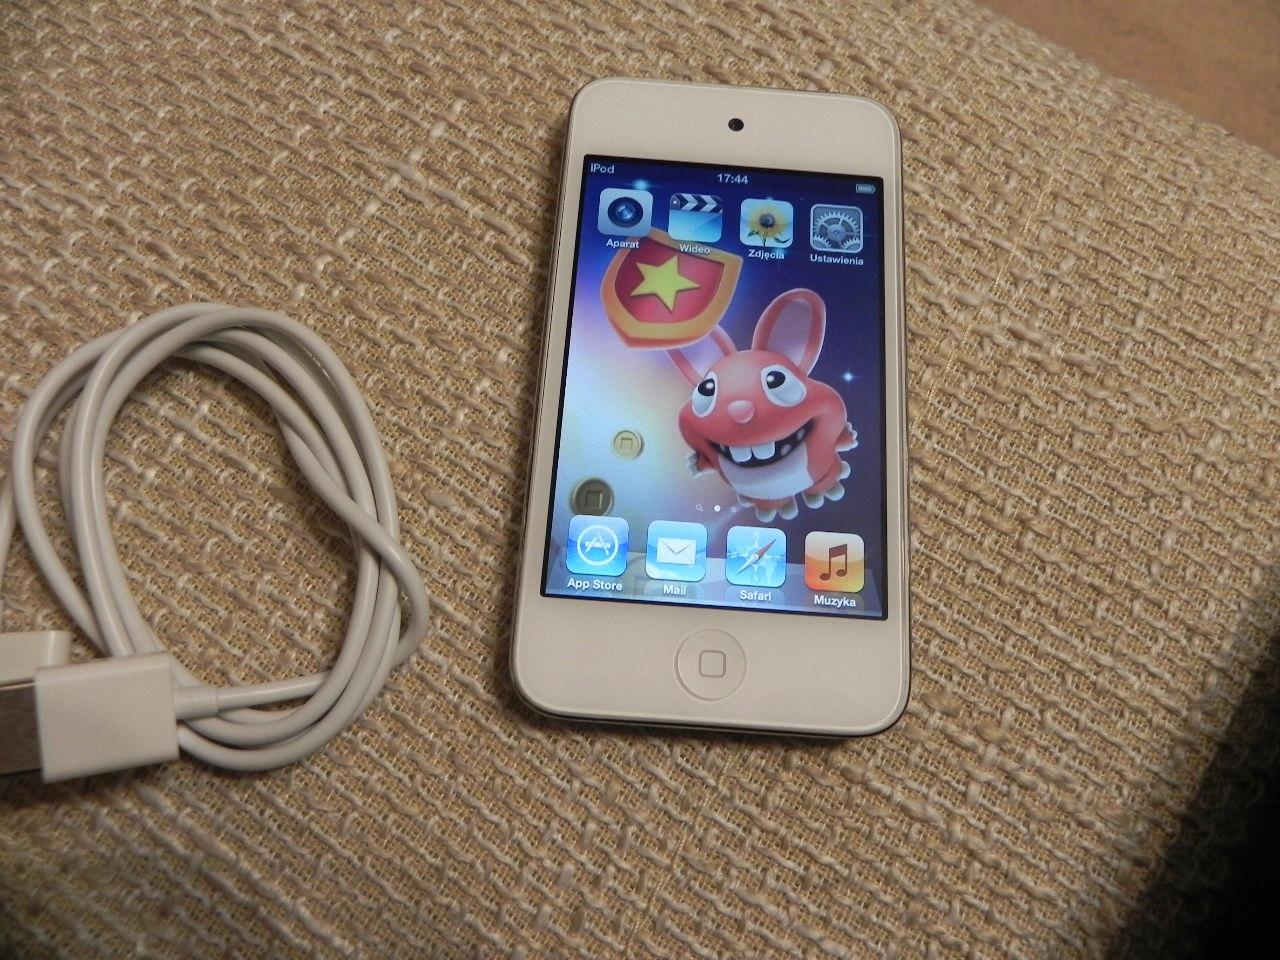 iPod*Touch*4g*32GB+Gratis!